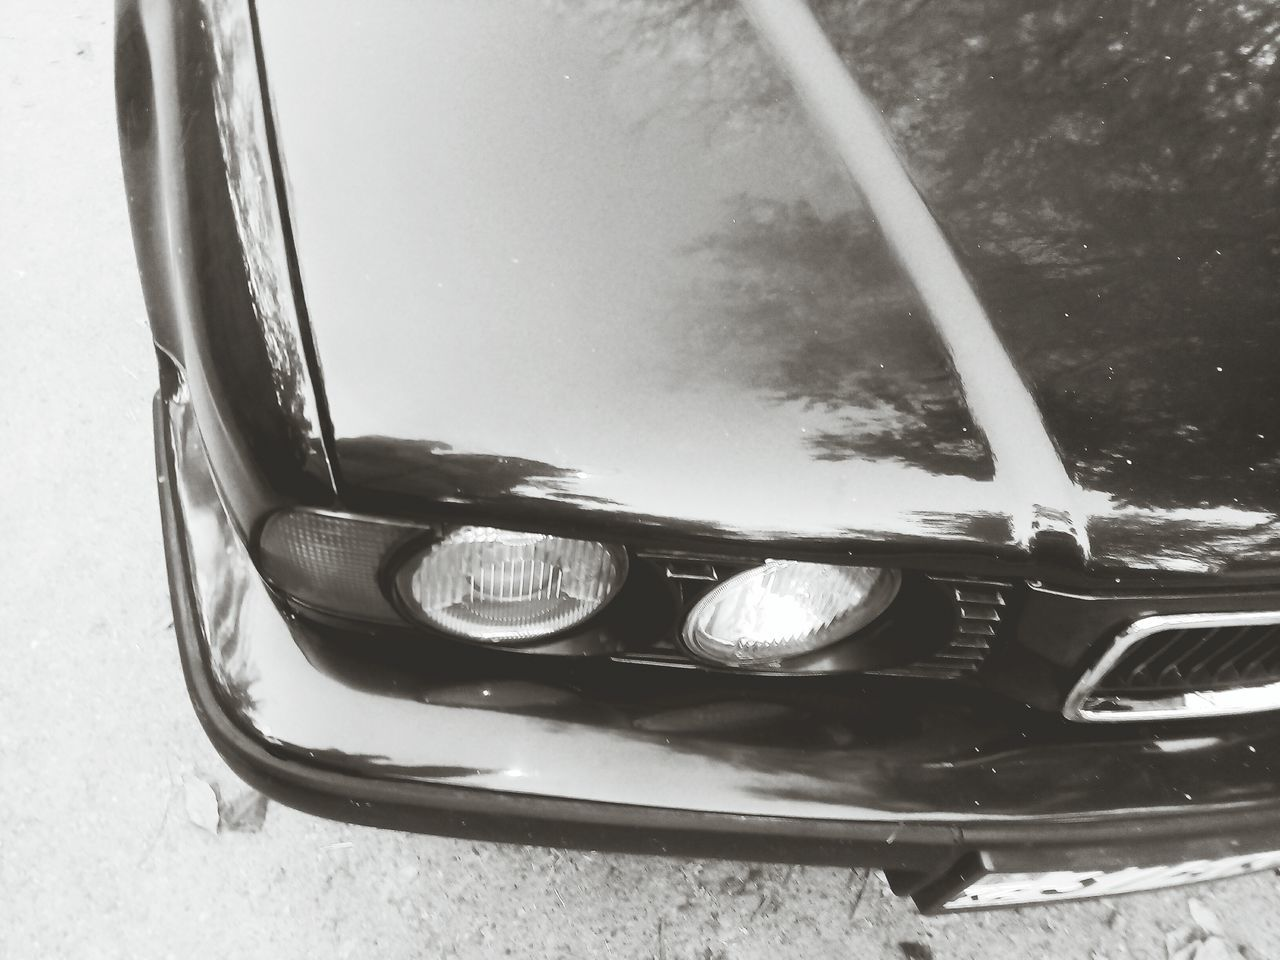 Bmw Car Day First Eyeem Photo City Streets  City Walking Greylife EyeEm Best Shots Eye4photography  Automotive Photography Beautiful ♥ Automobile Auto Fine Art Photography Eye4photography  No People Bmw I ♥ It Bmw Car BMW!!!